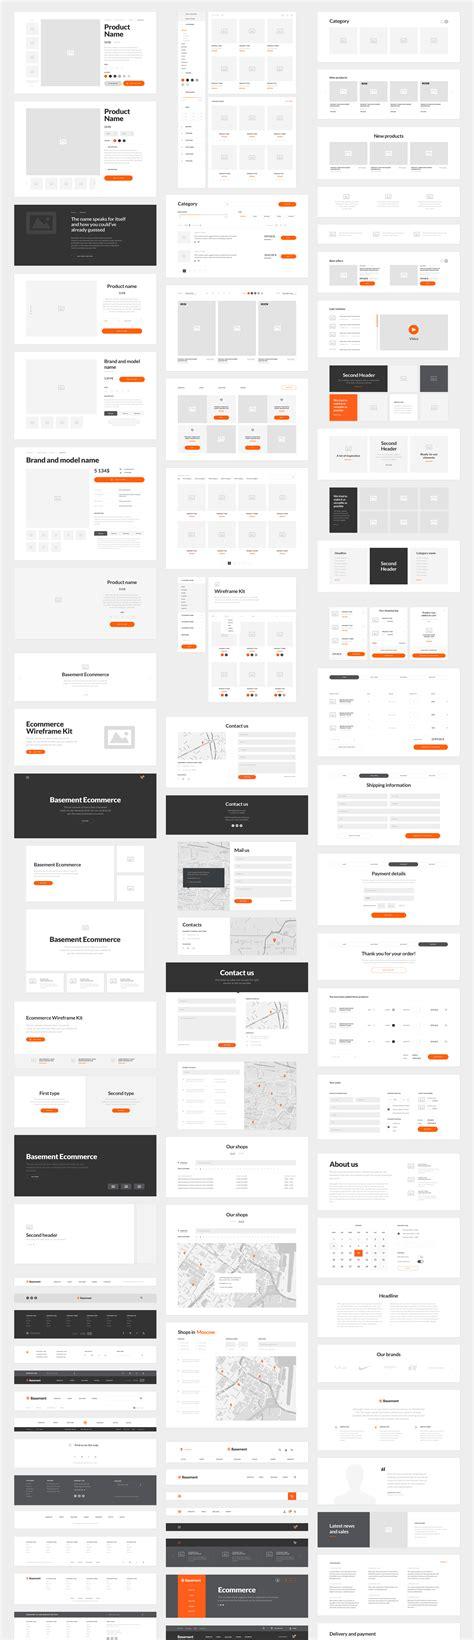 header design ecommerce ecommerce 9 categories headers promo features catalog